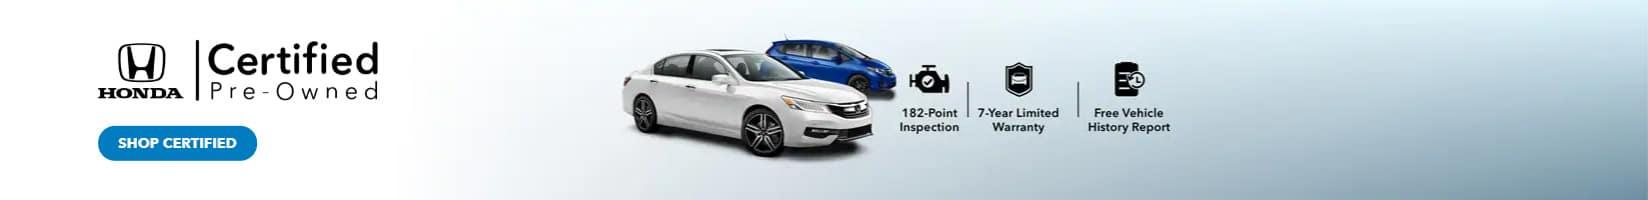 shop-honda-used-certified-vehicles-near-cincinnati-ohio